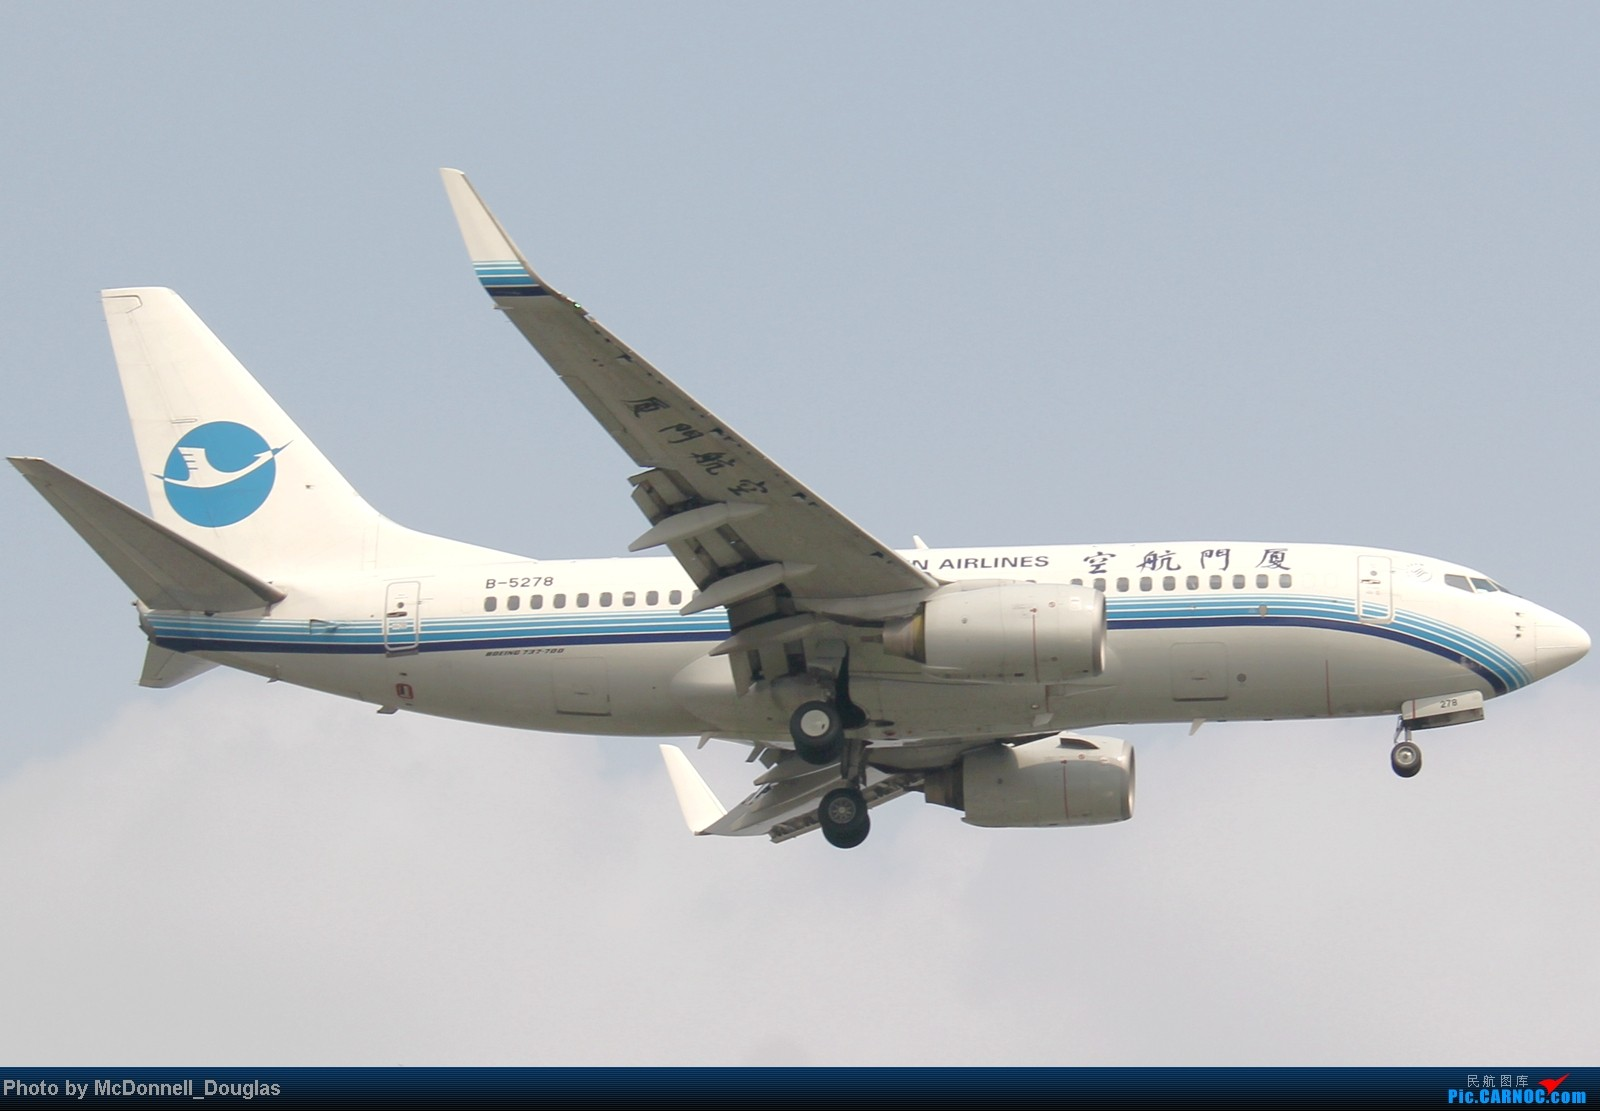 Re:[原创]【上海飞友会】ZSSS杂图一组 BOEING 737-700 B-5278 中国上海虹桥机场